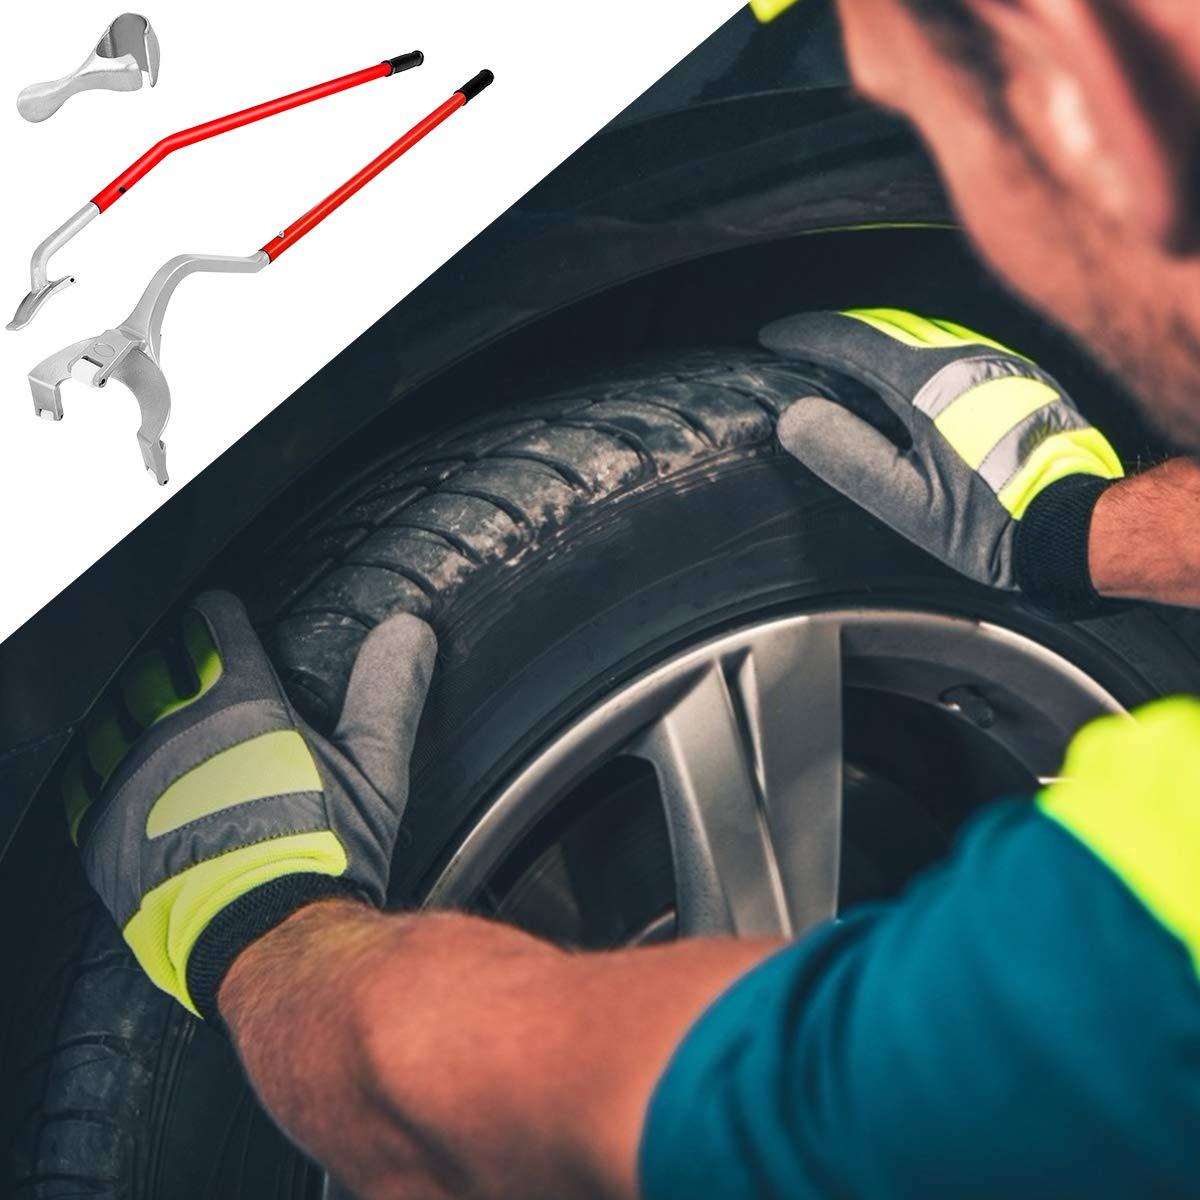 Goplus Tire Changer, 17.5'' to 24'' Steel Tire Mount Demount Tool Kit, Tubeless Truck Bead Breaker Manual Tire Changing Tool (Red) by Goplus (Image #7)